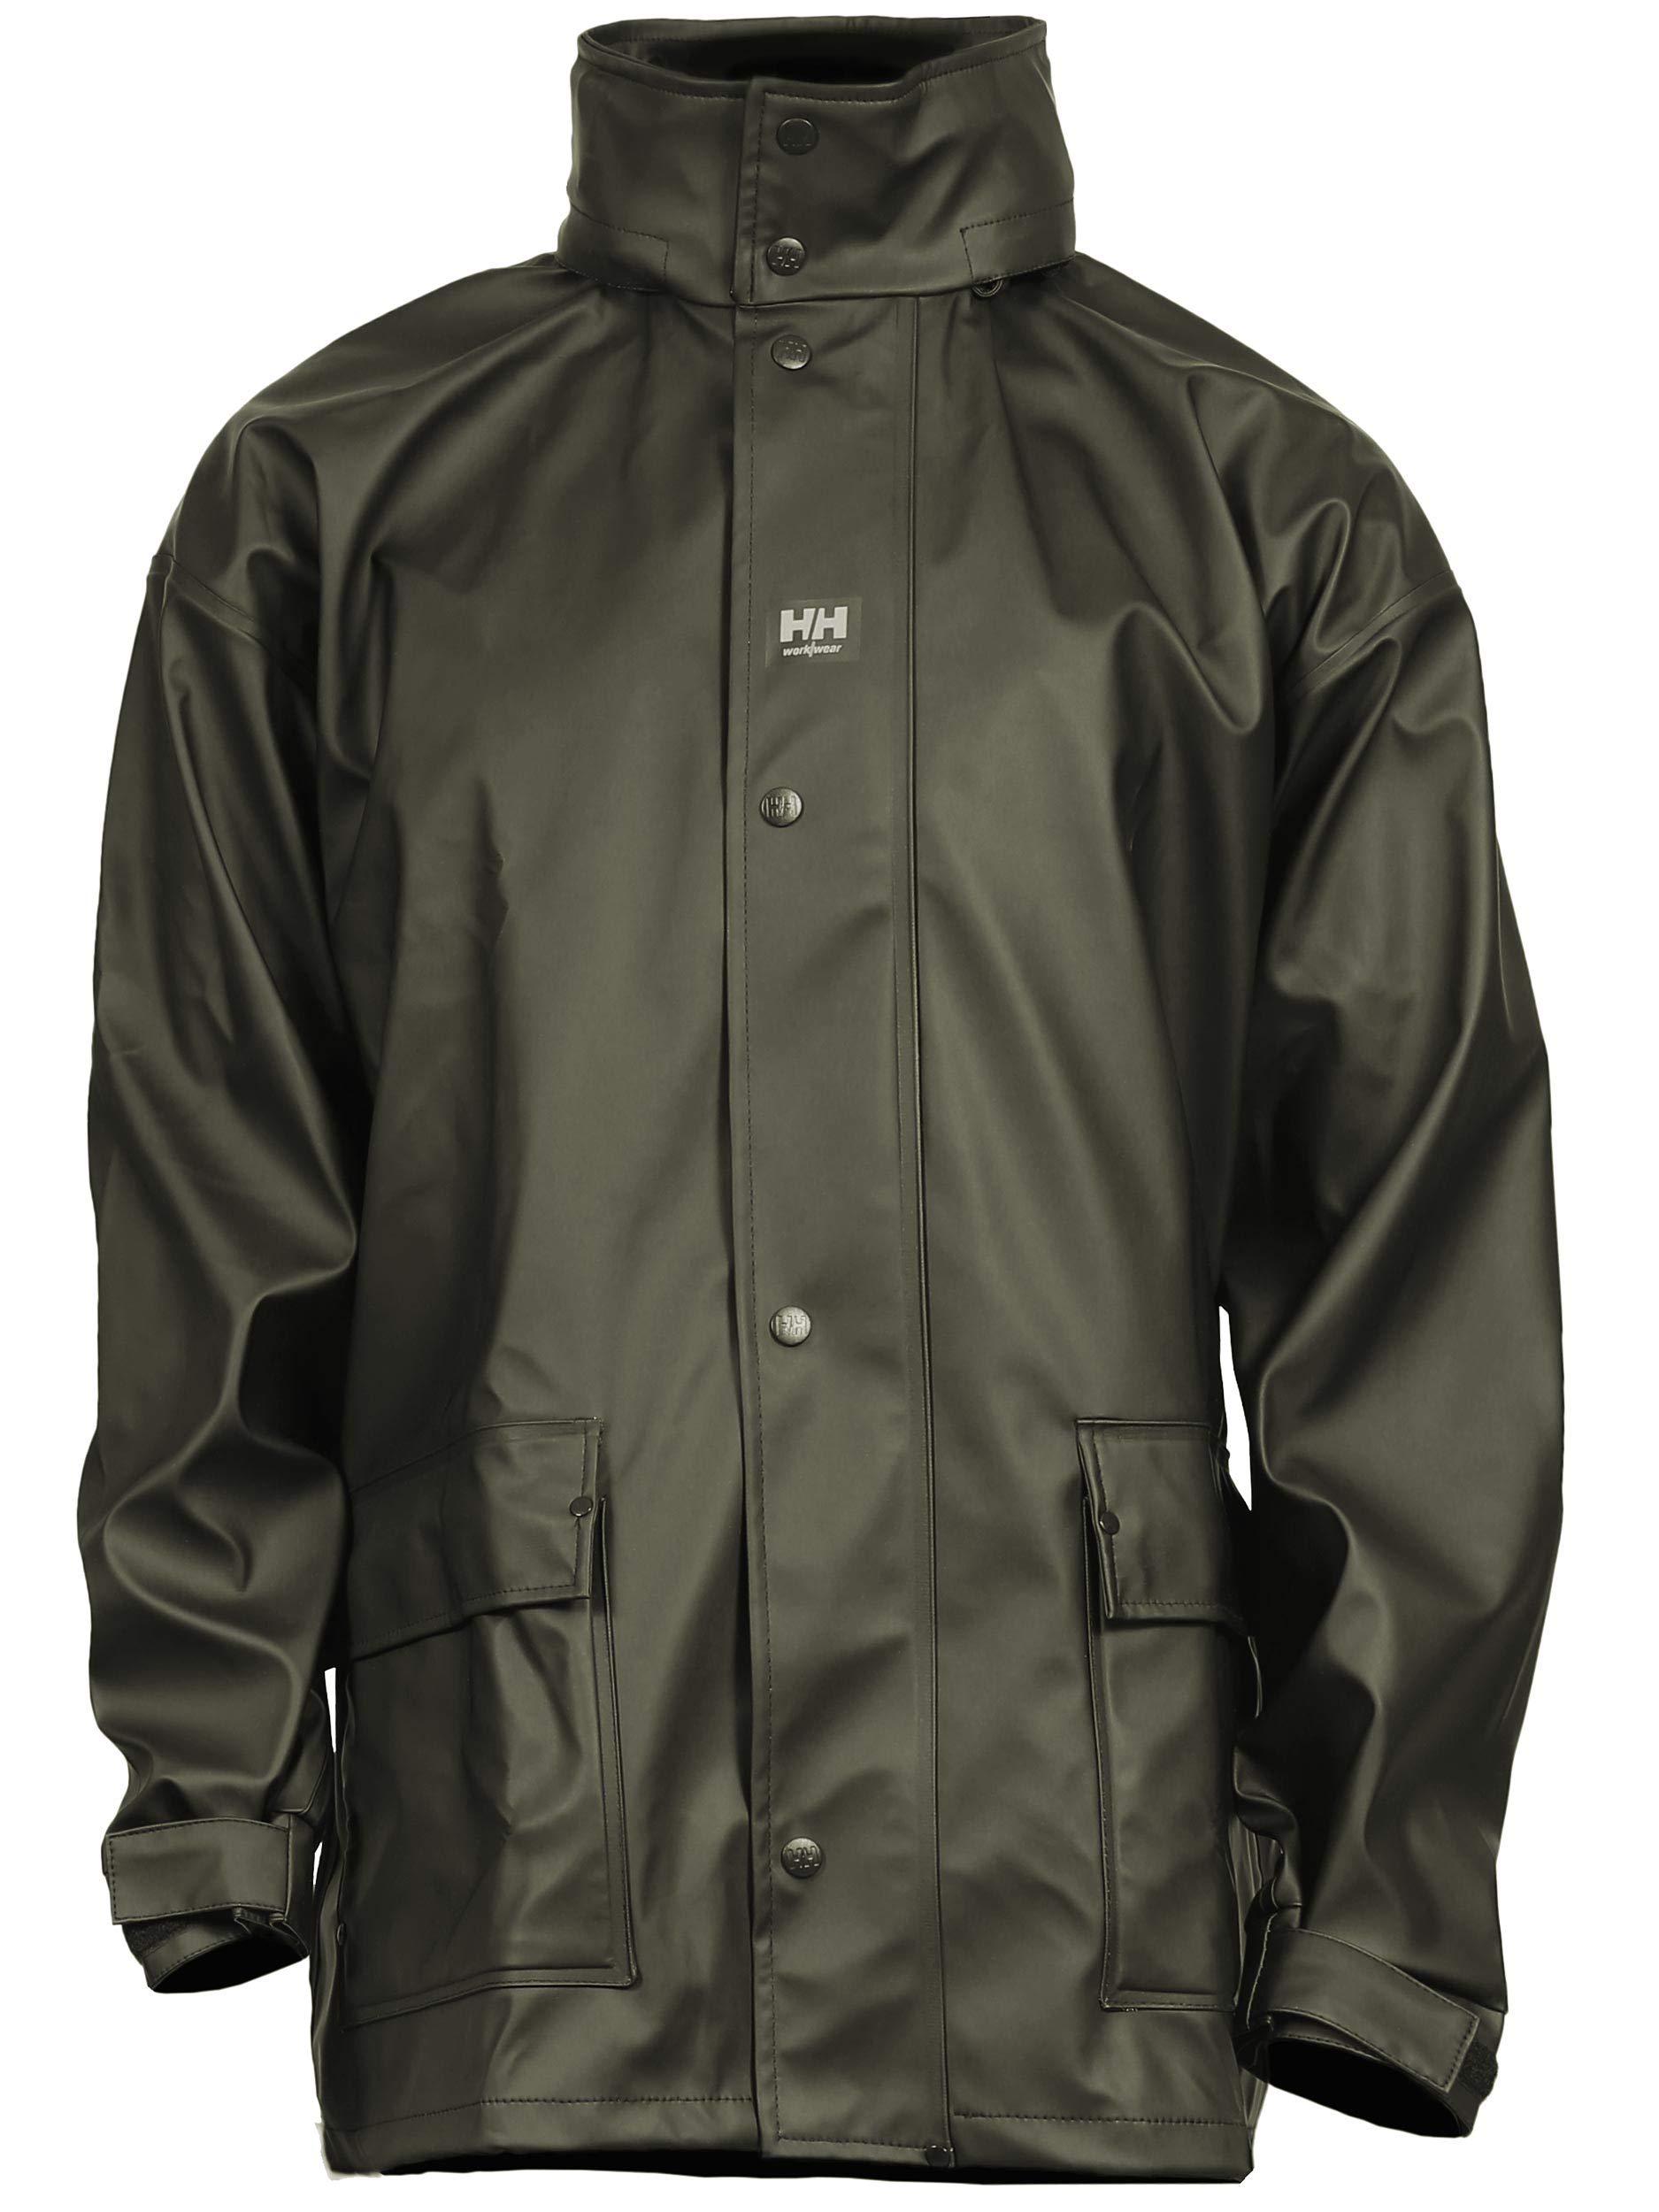 Helly Hansen Men's Impertech II Deluxe Jacket Green/Brown, medium by Helly Hansen